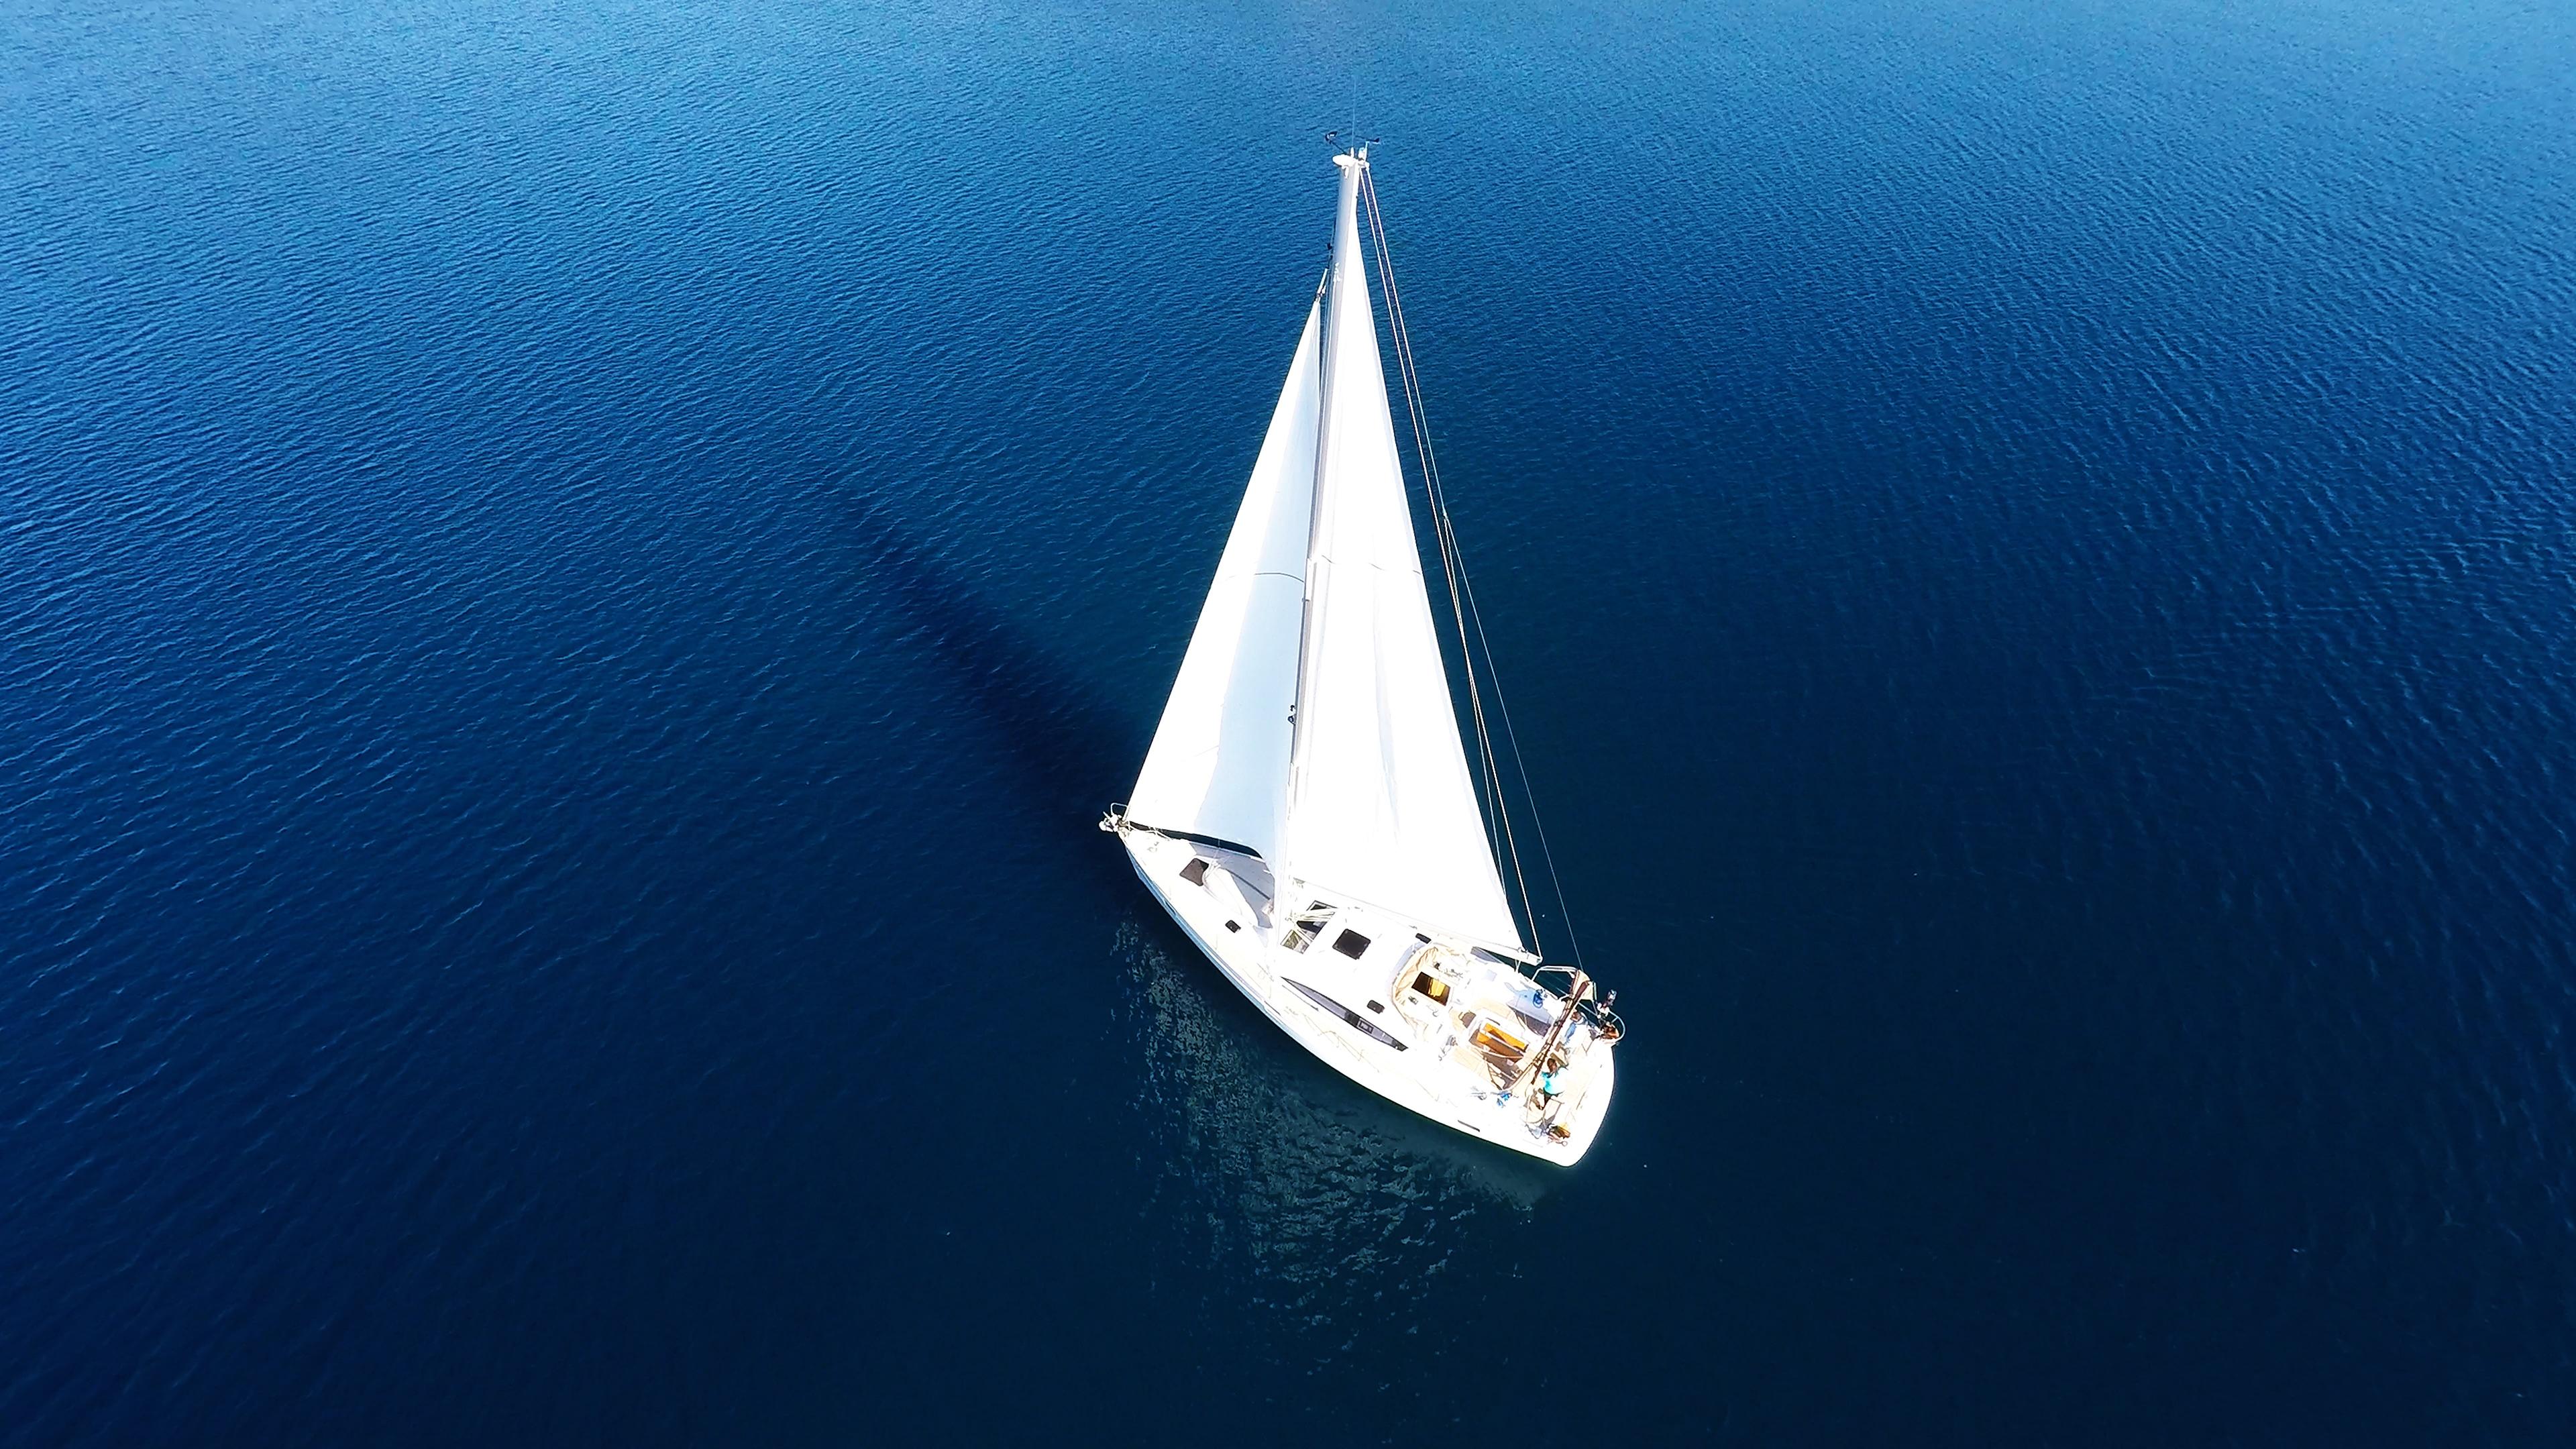 barcha a vela barca a vela yacht a vela mare blu vele barca